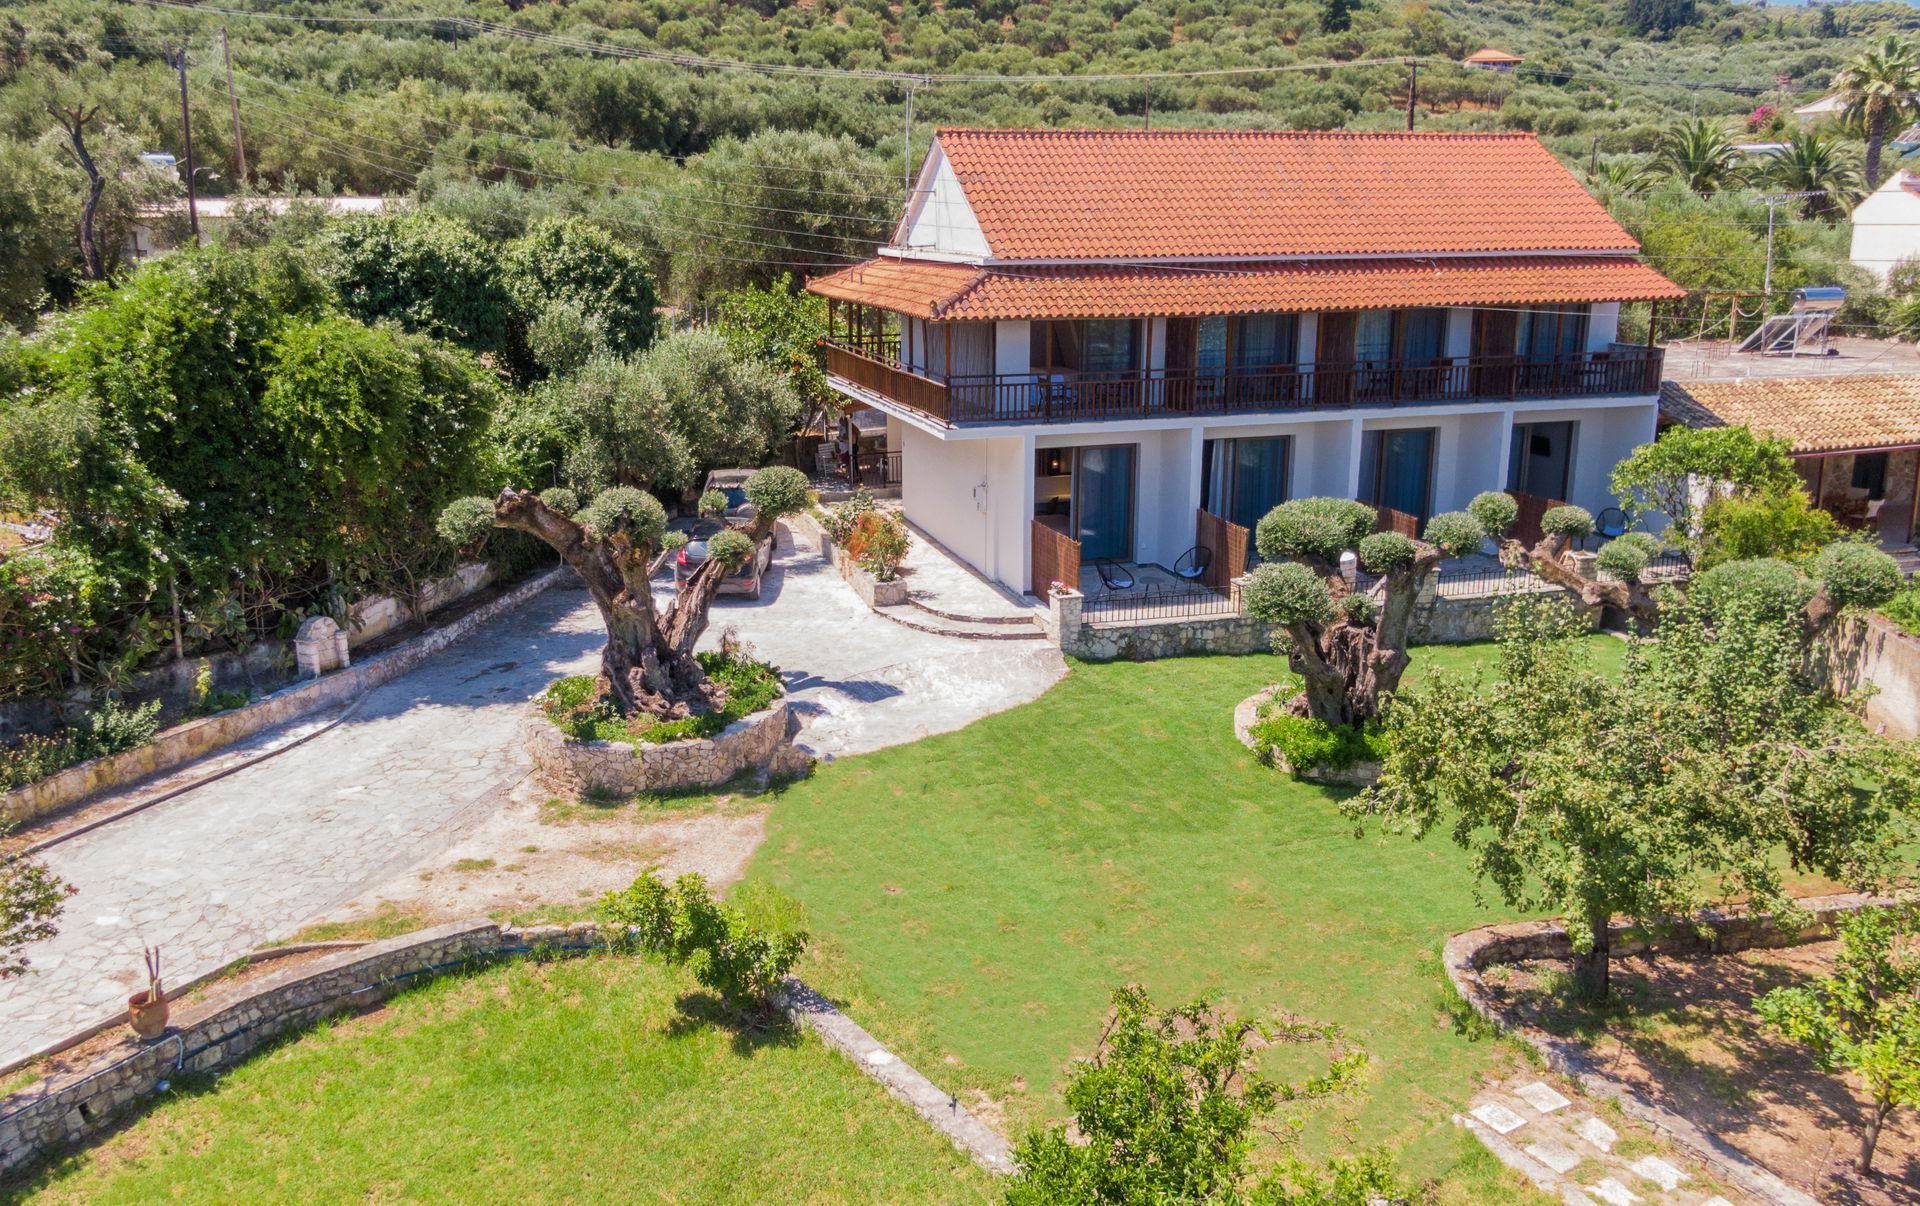 Eptanisos Beachfront Suites Zante - Zάκυνθος ✦ 2 Ημέρες